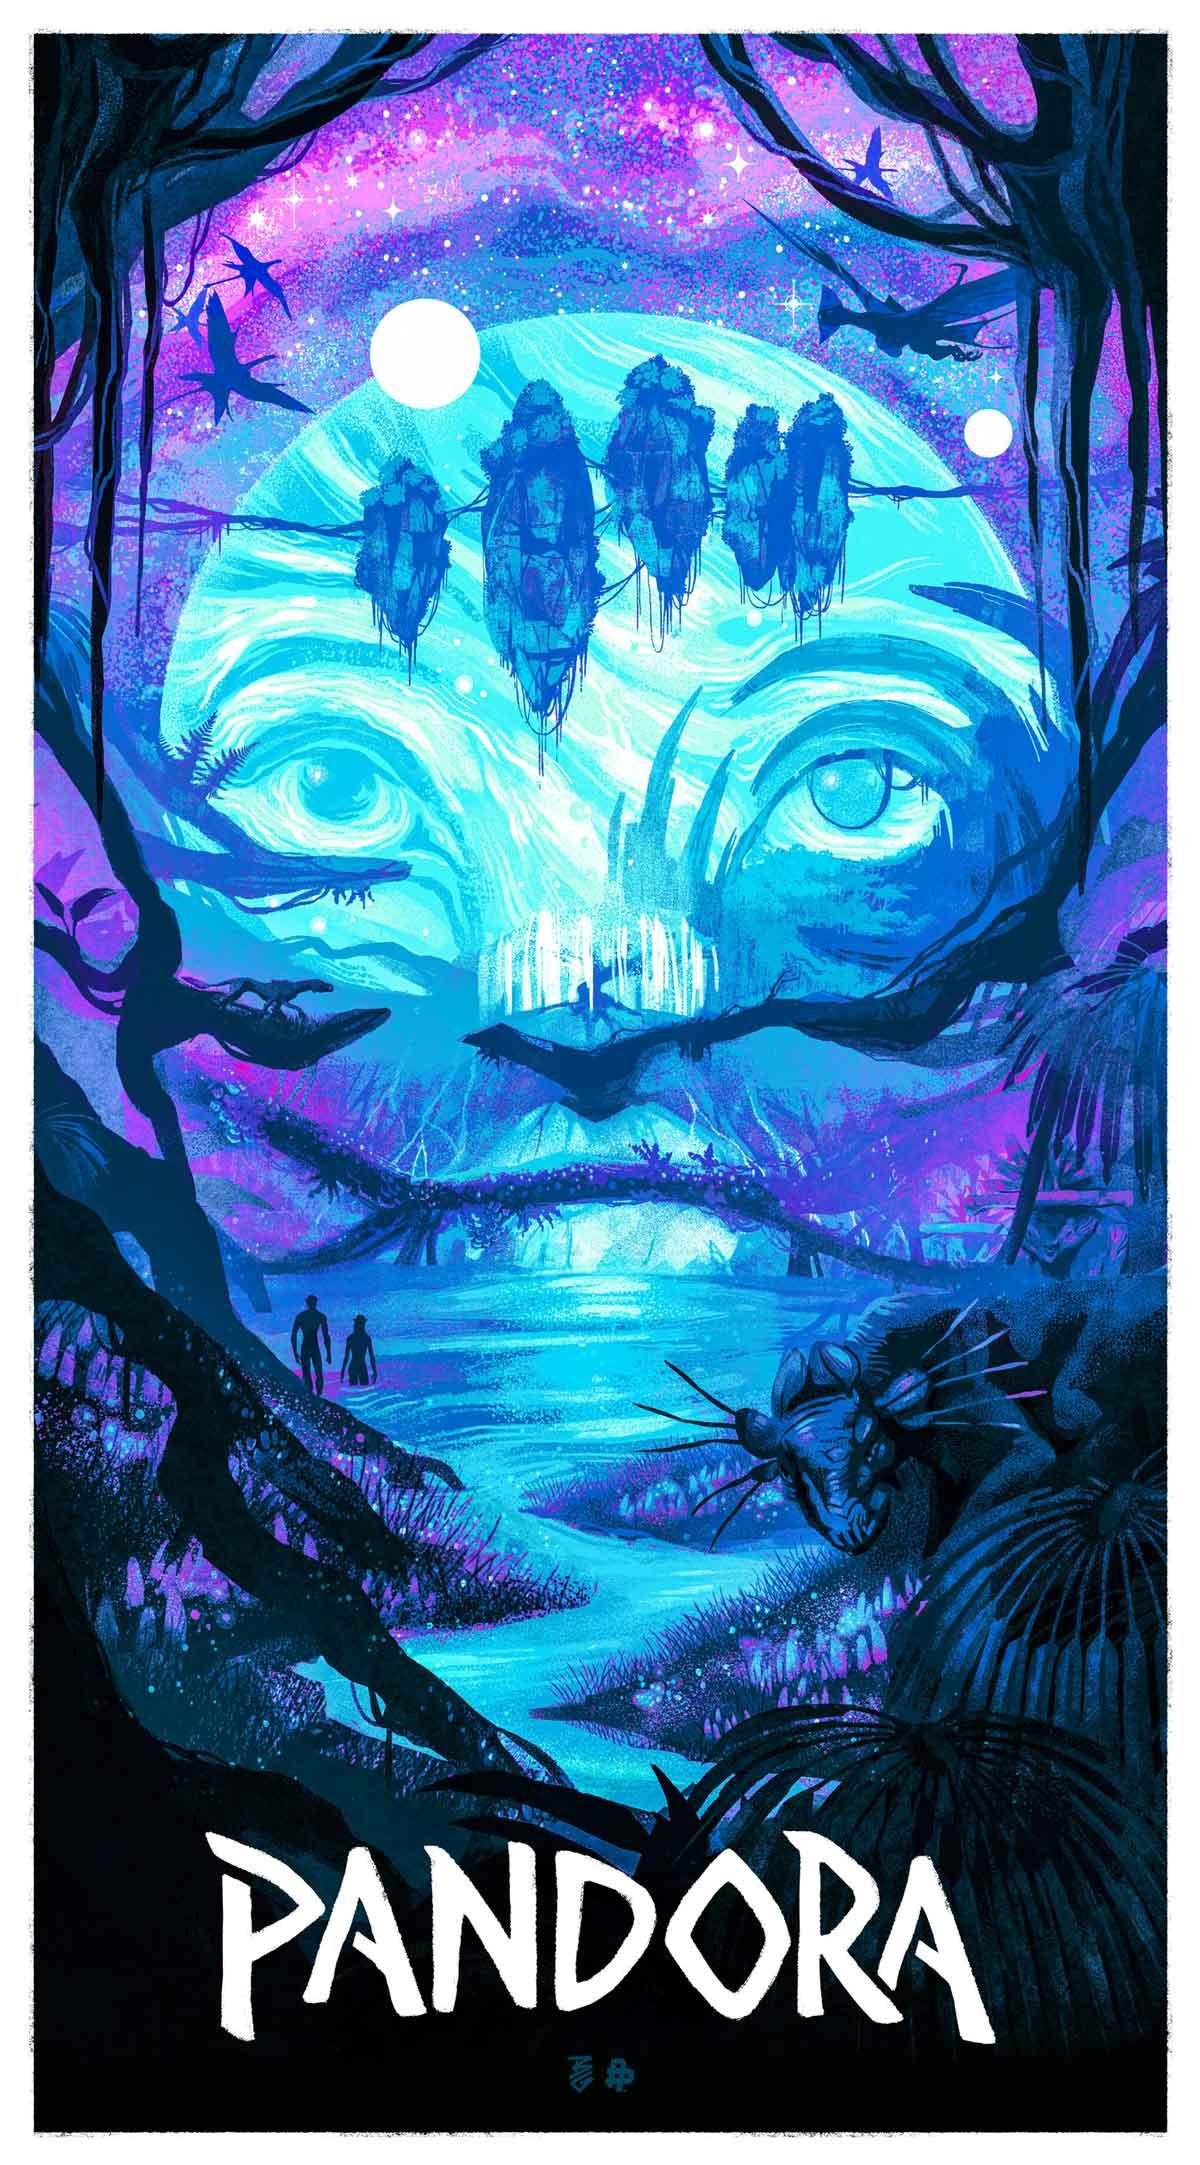 Avatar Pandora poster